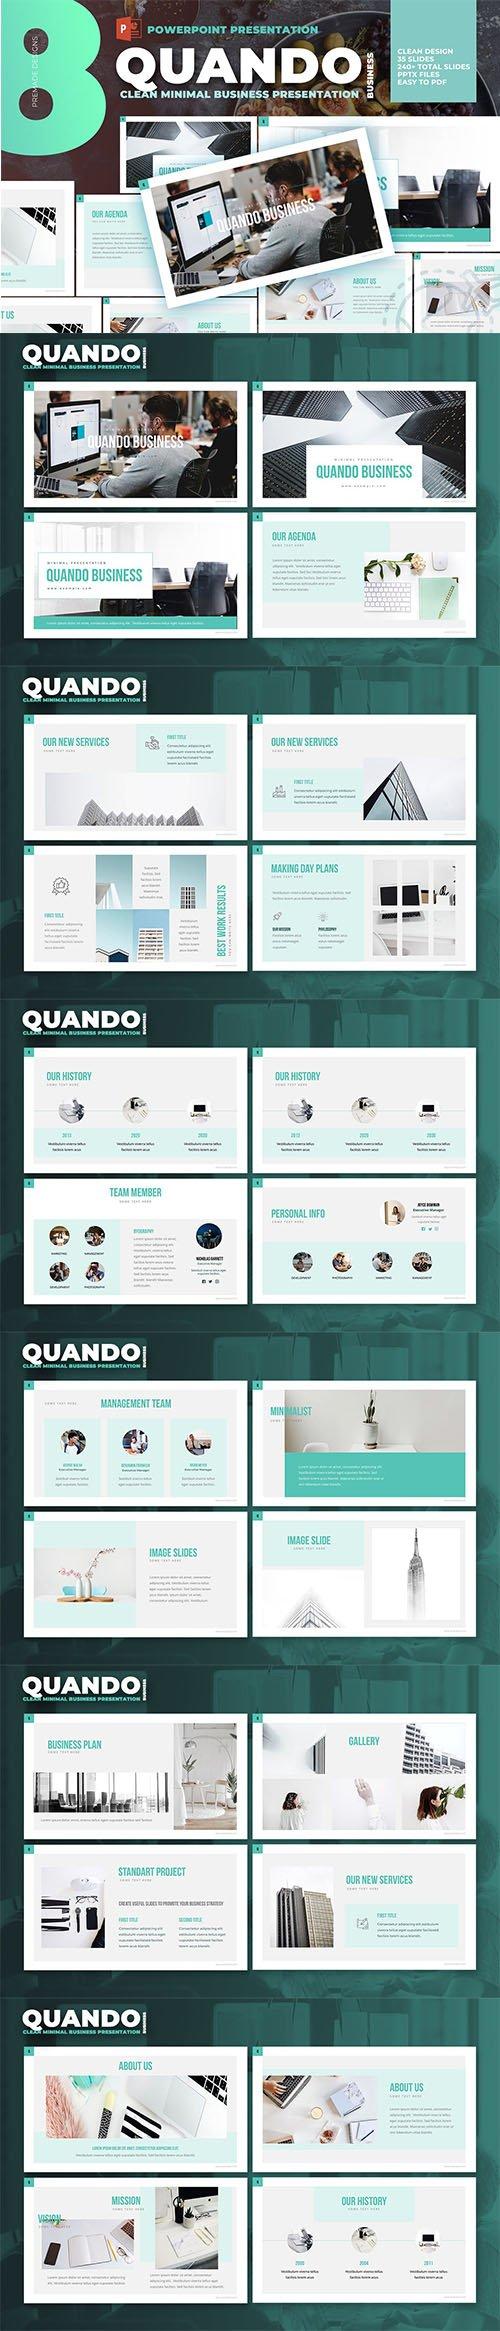 Quando - Clean and Minimal Presentation PPTX Template